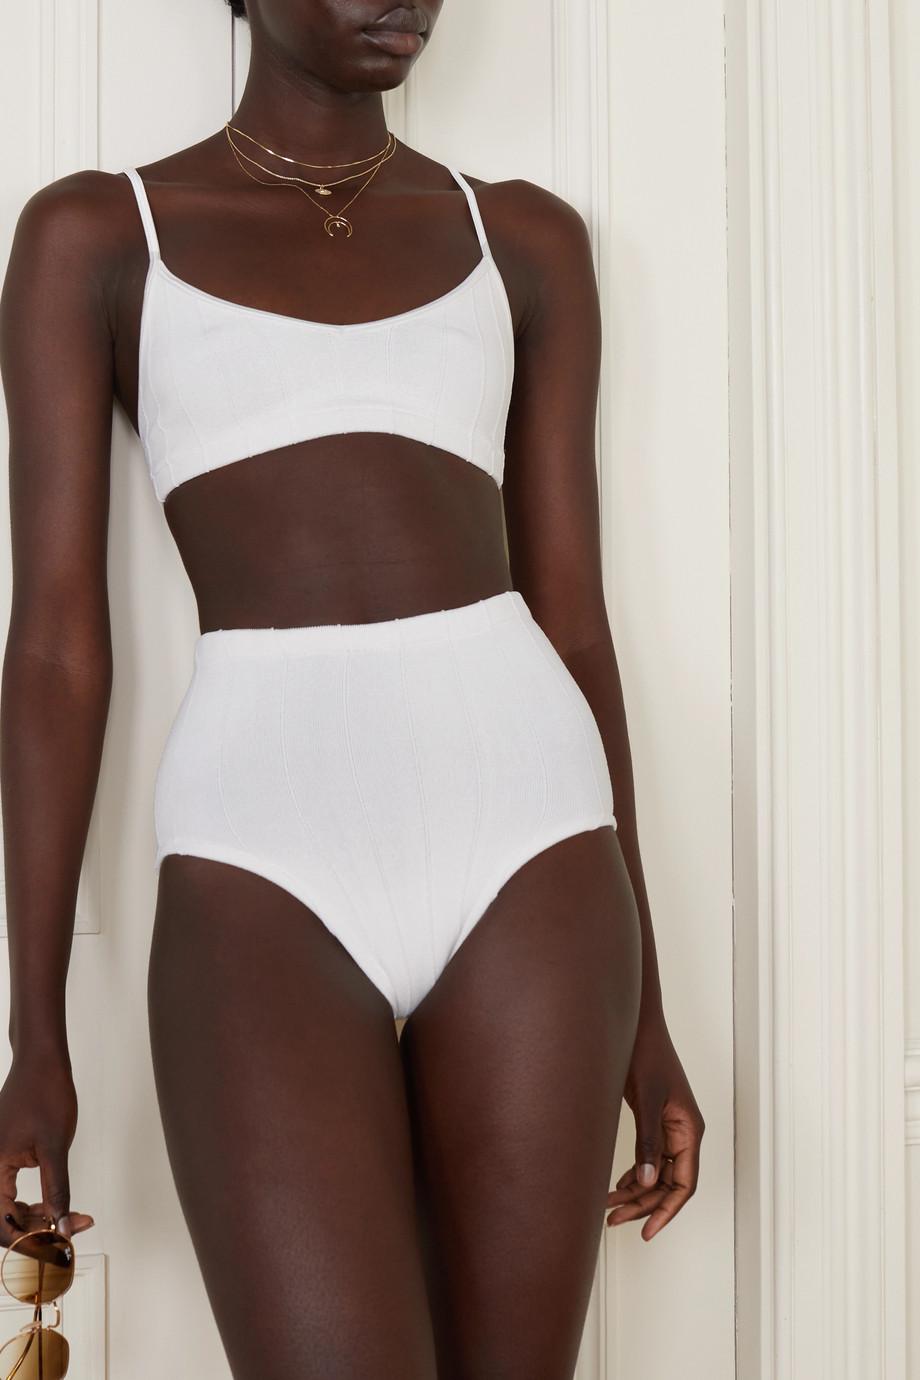 Hunza G + NET SUSTAIN Duo Betty Nile gerippter Bikini